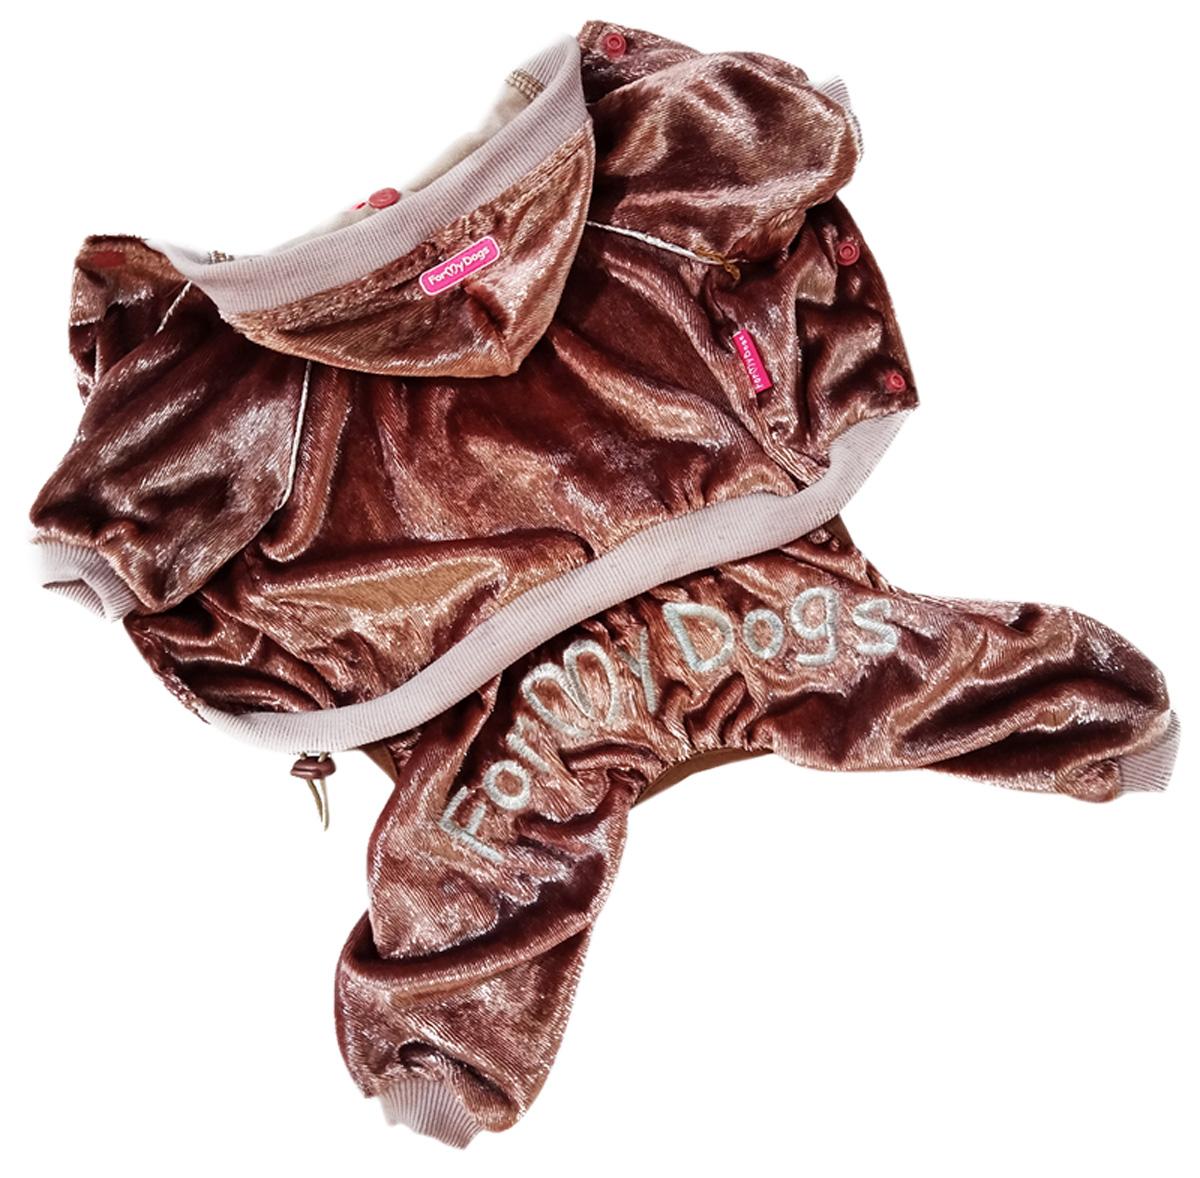 For My Dogs костюм для собак велюр коричневый 491ss-2020 Br (16)